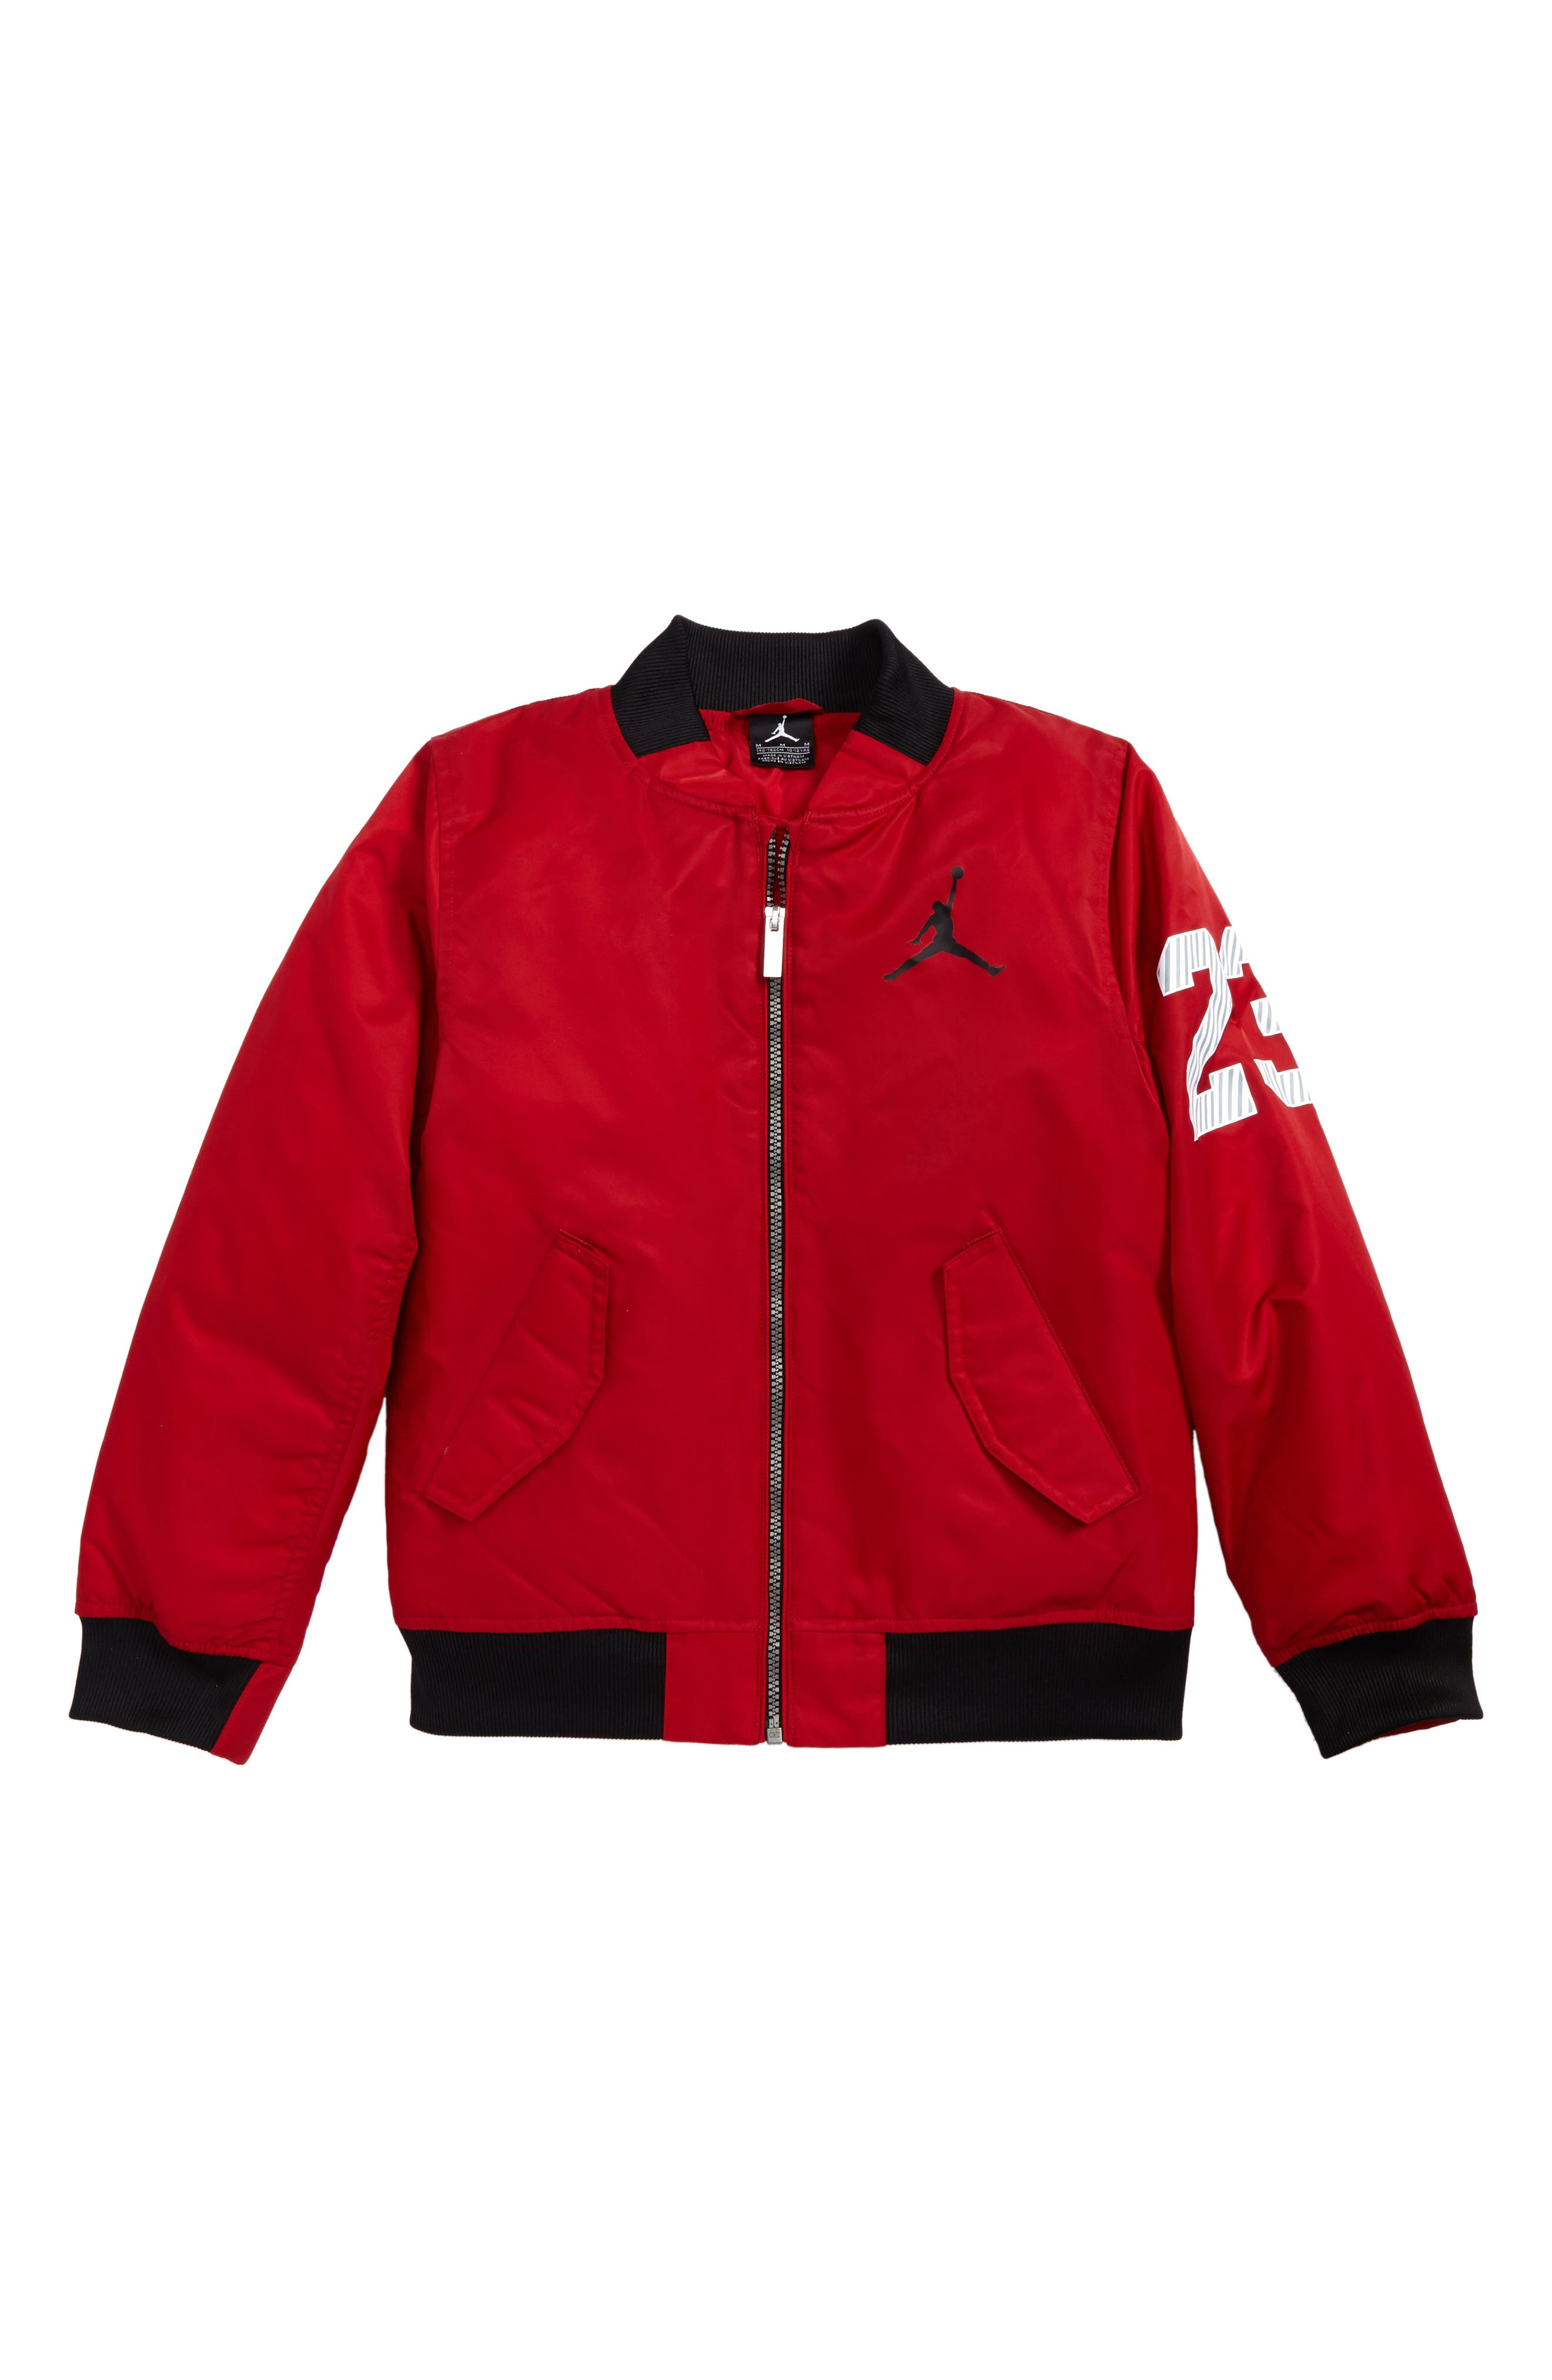 Jordan Fall in Line Jacket,                         Main,                         color, Gym Red